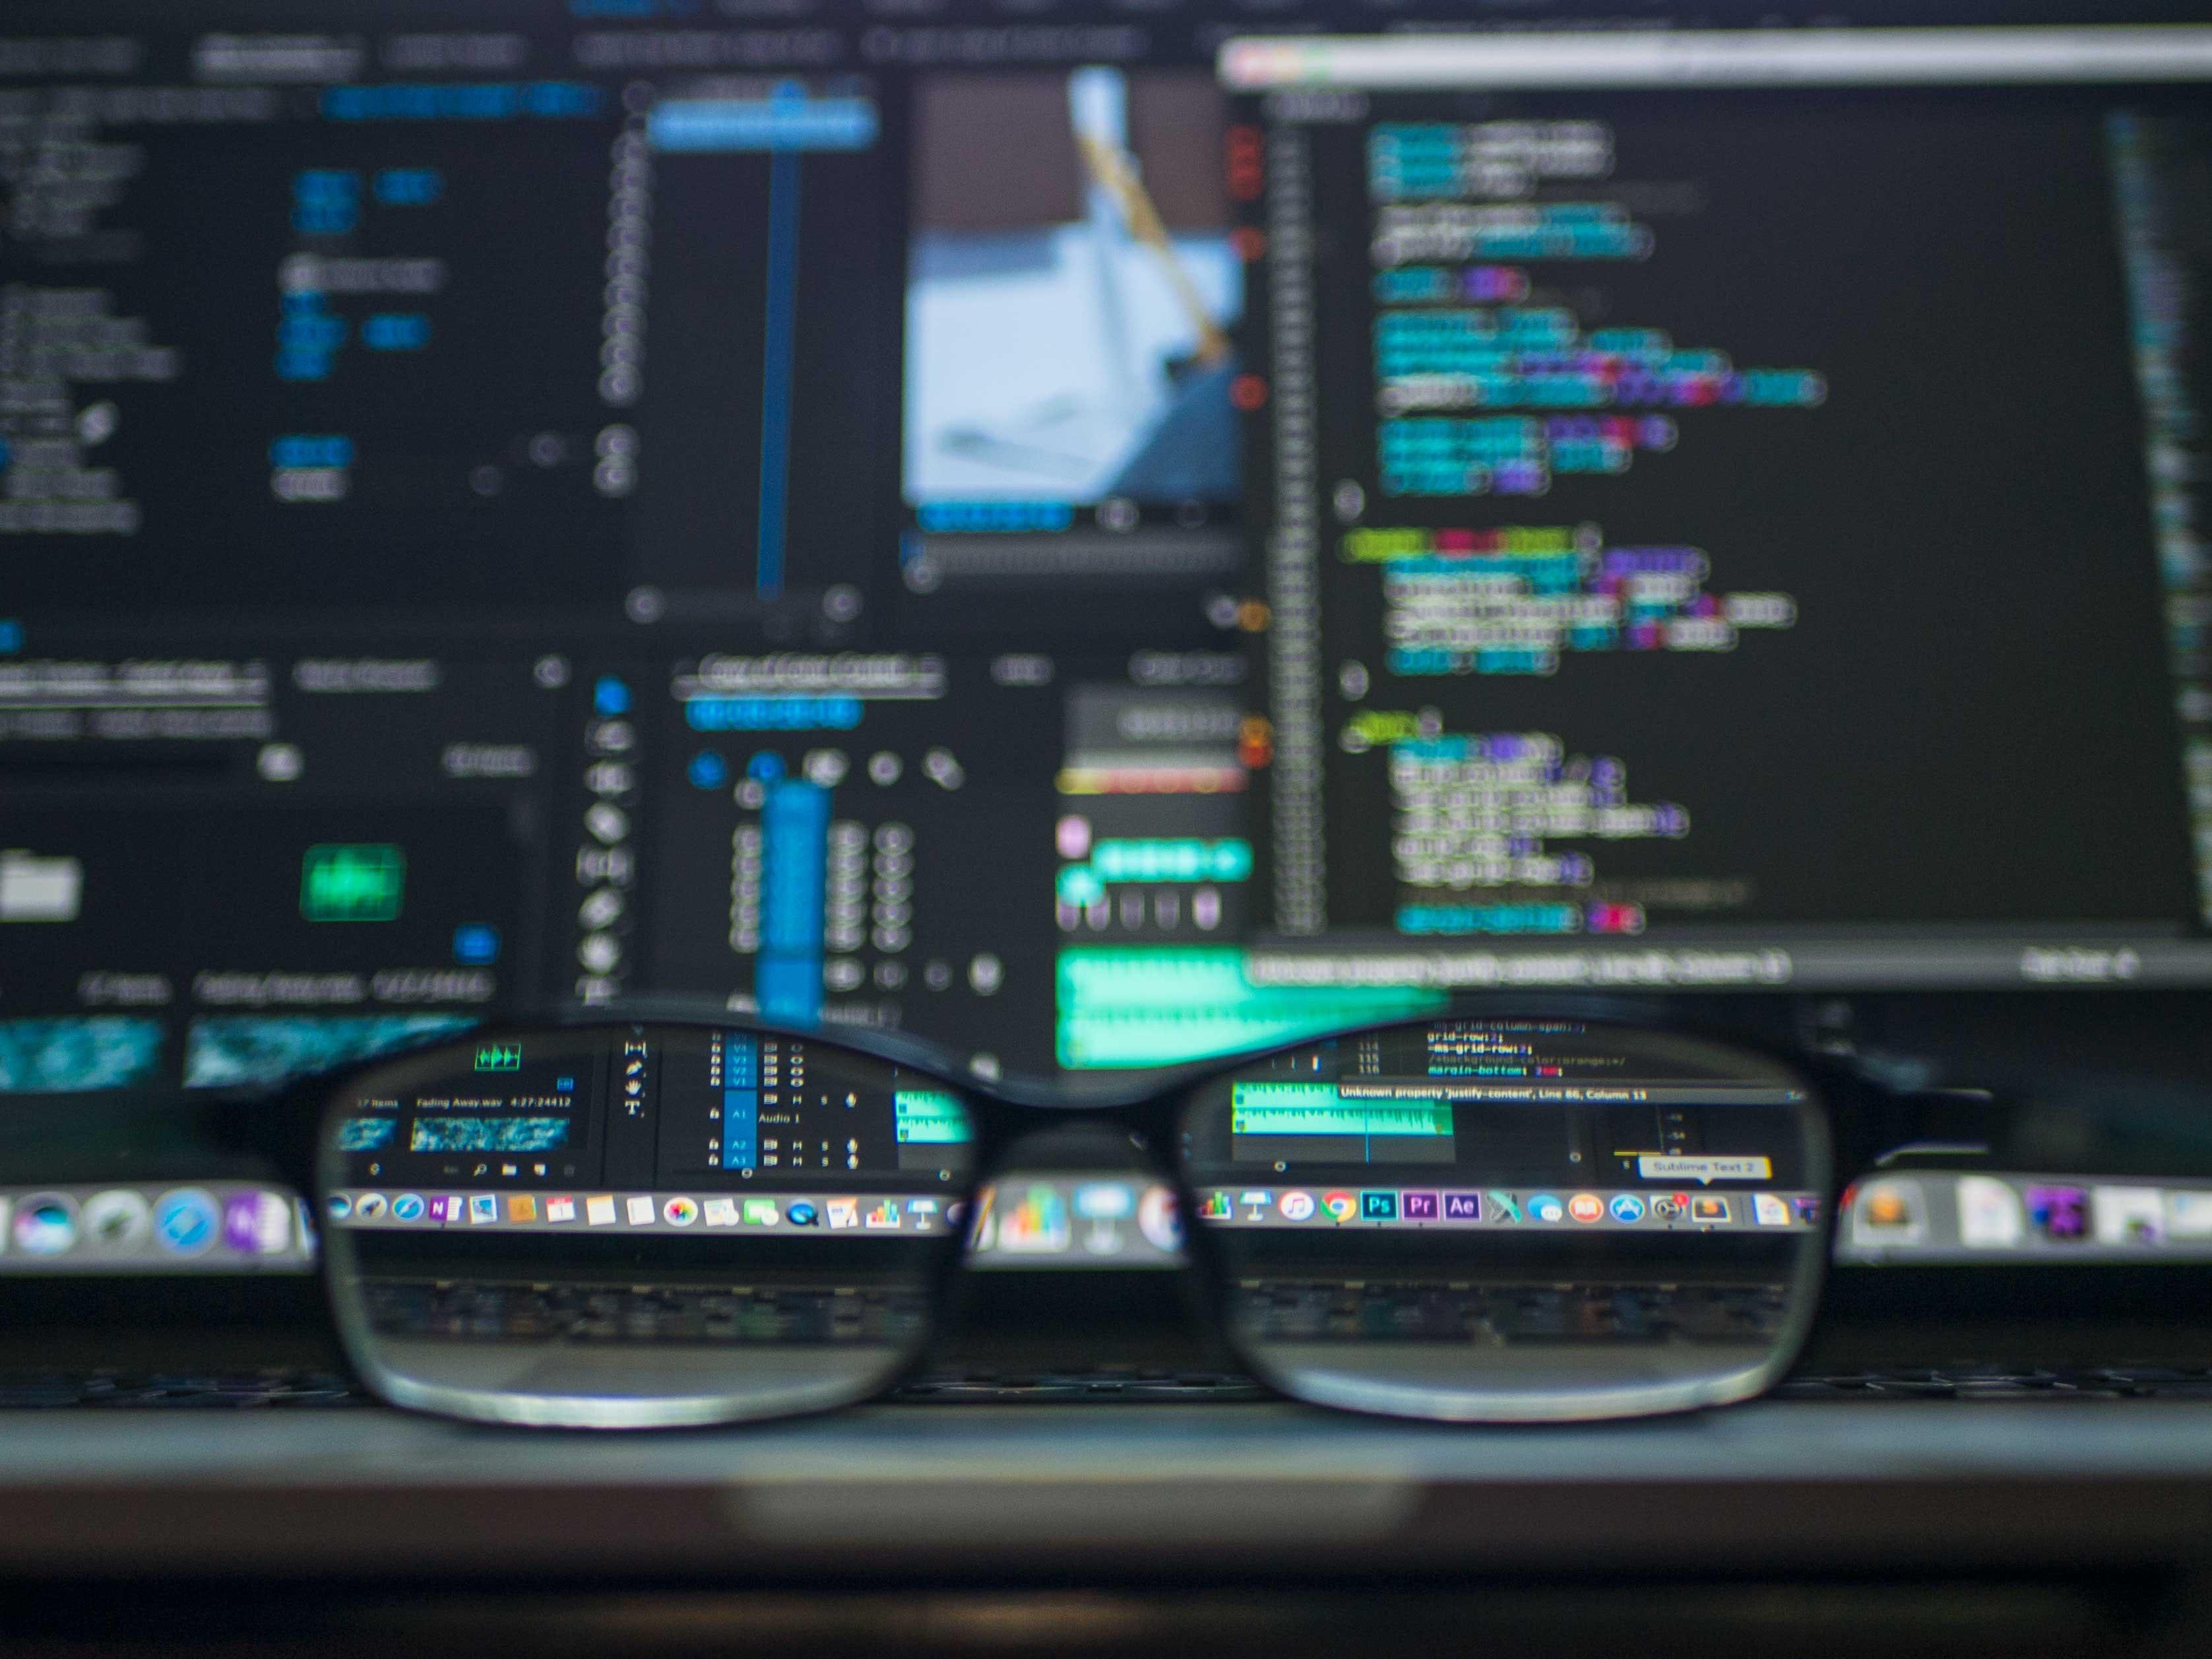 اهمیت دادهکاوی در استارتاپها